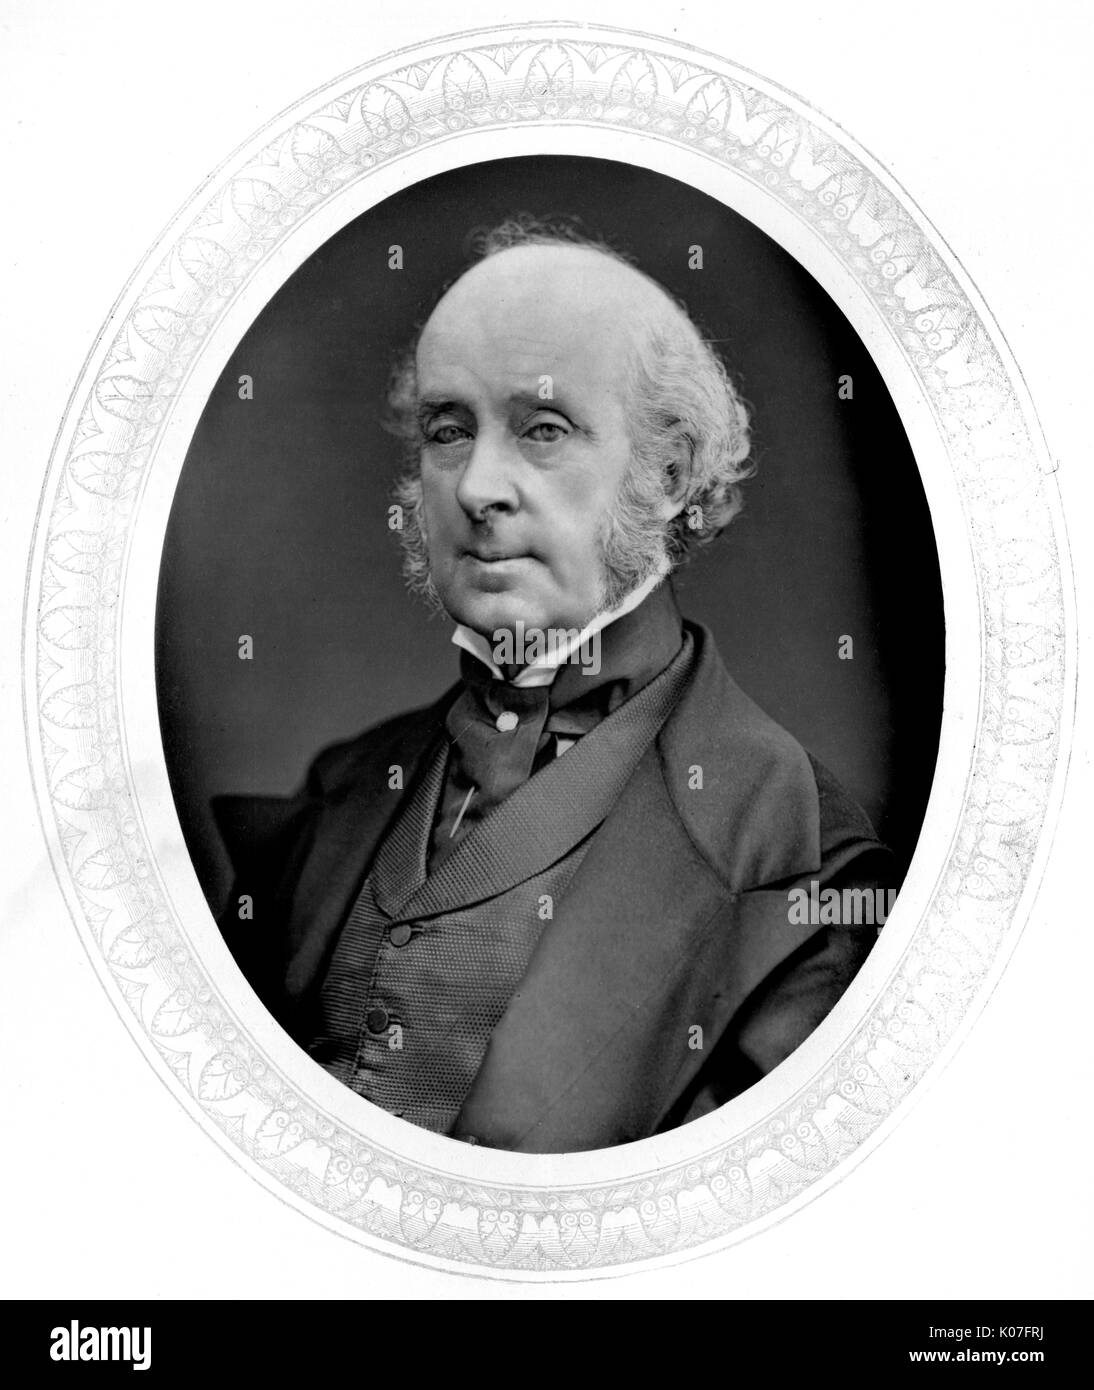 James Malbot (1805 - 1883), Lord Talbot of  Malahide Archeologist : photo 1876       Date: - Stock Image